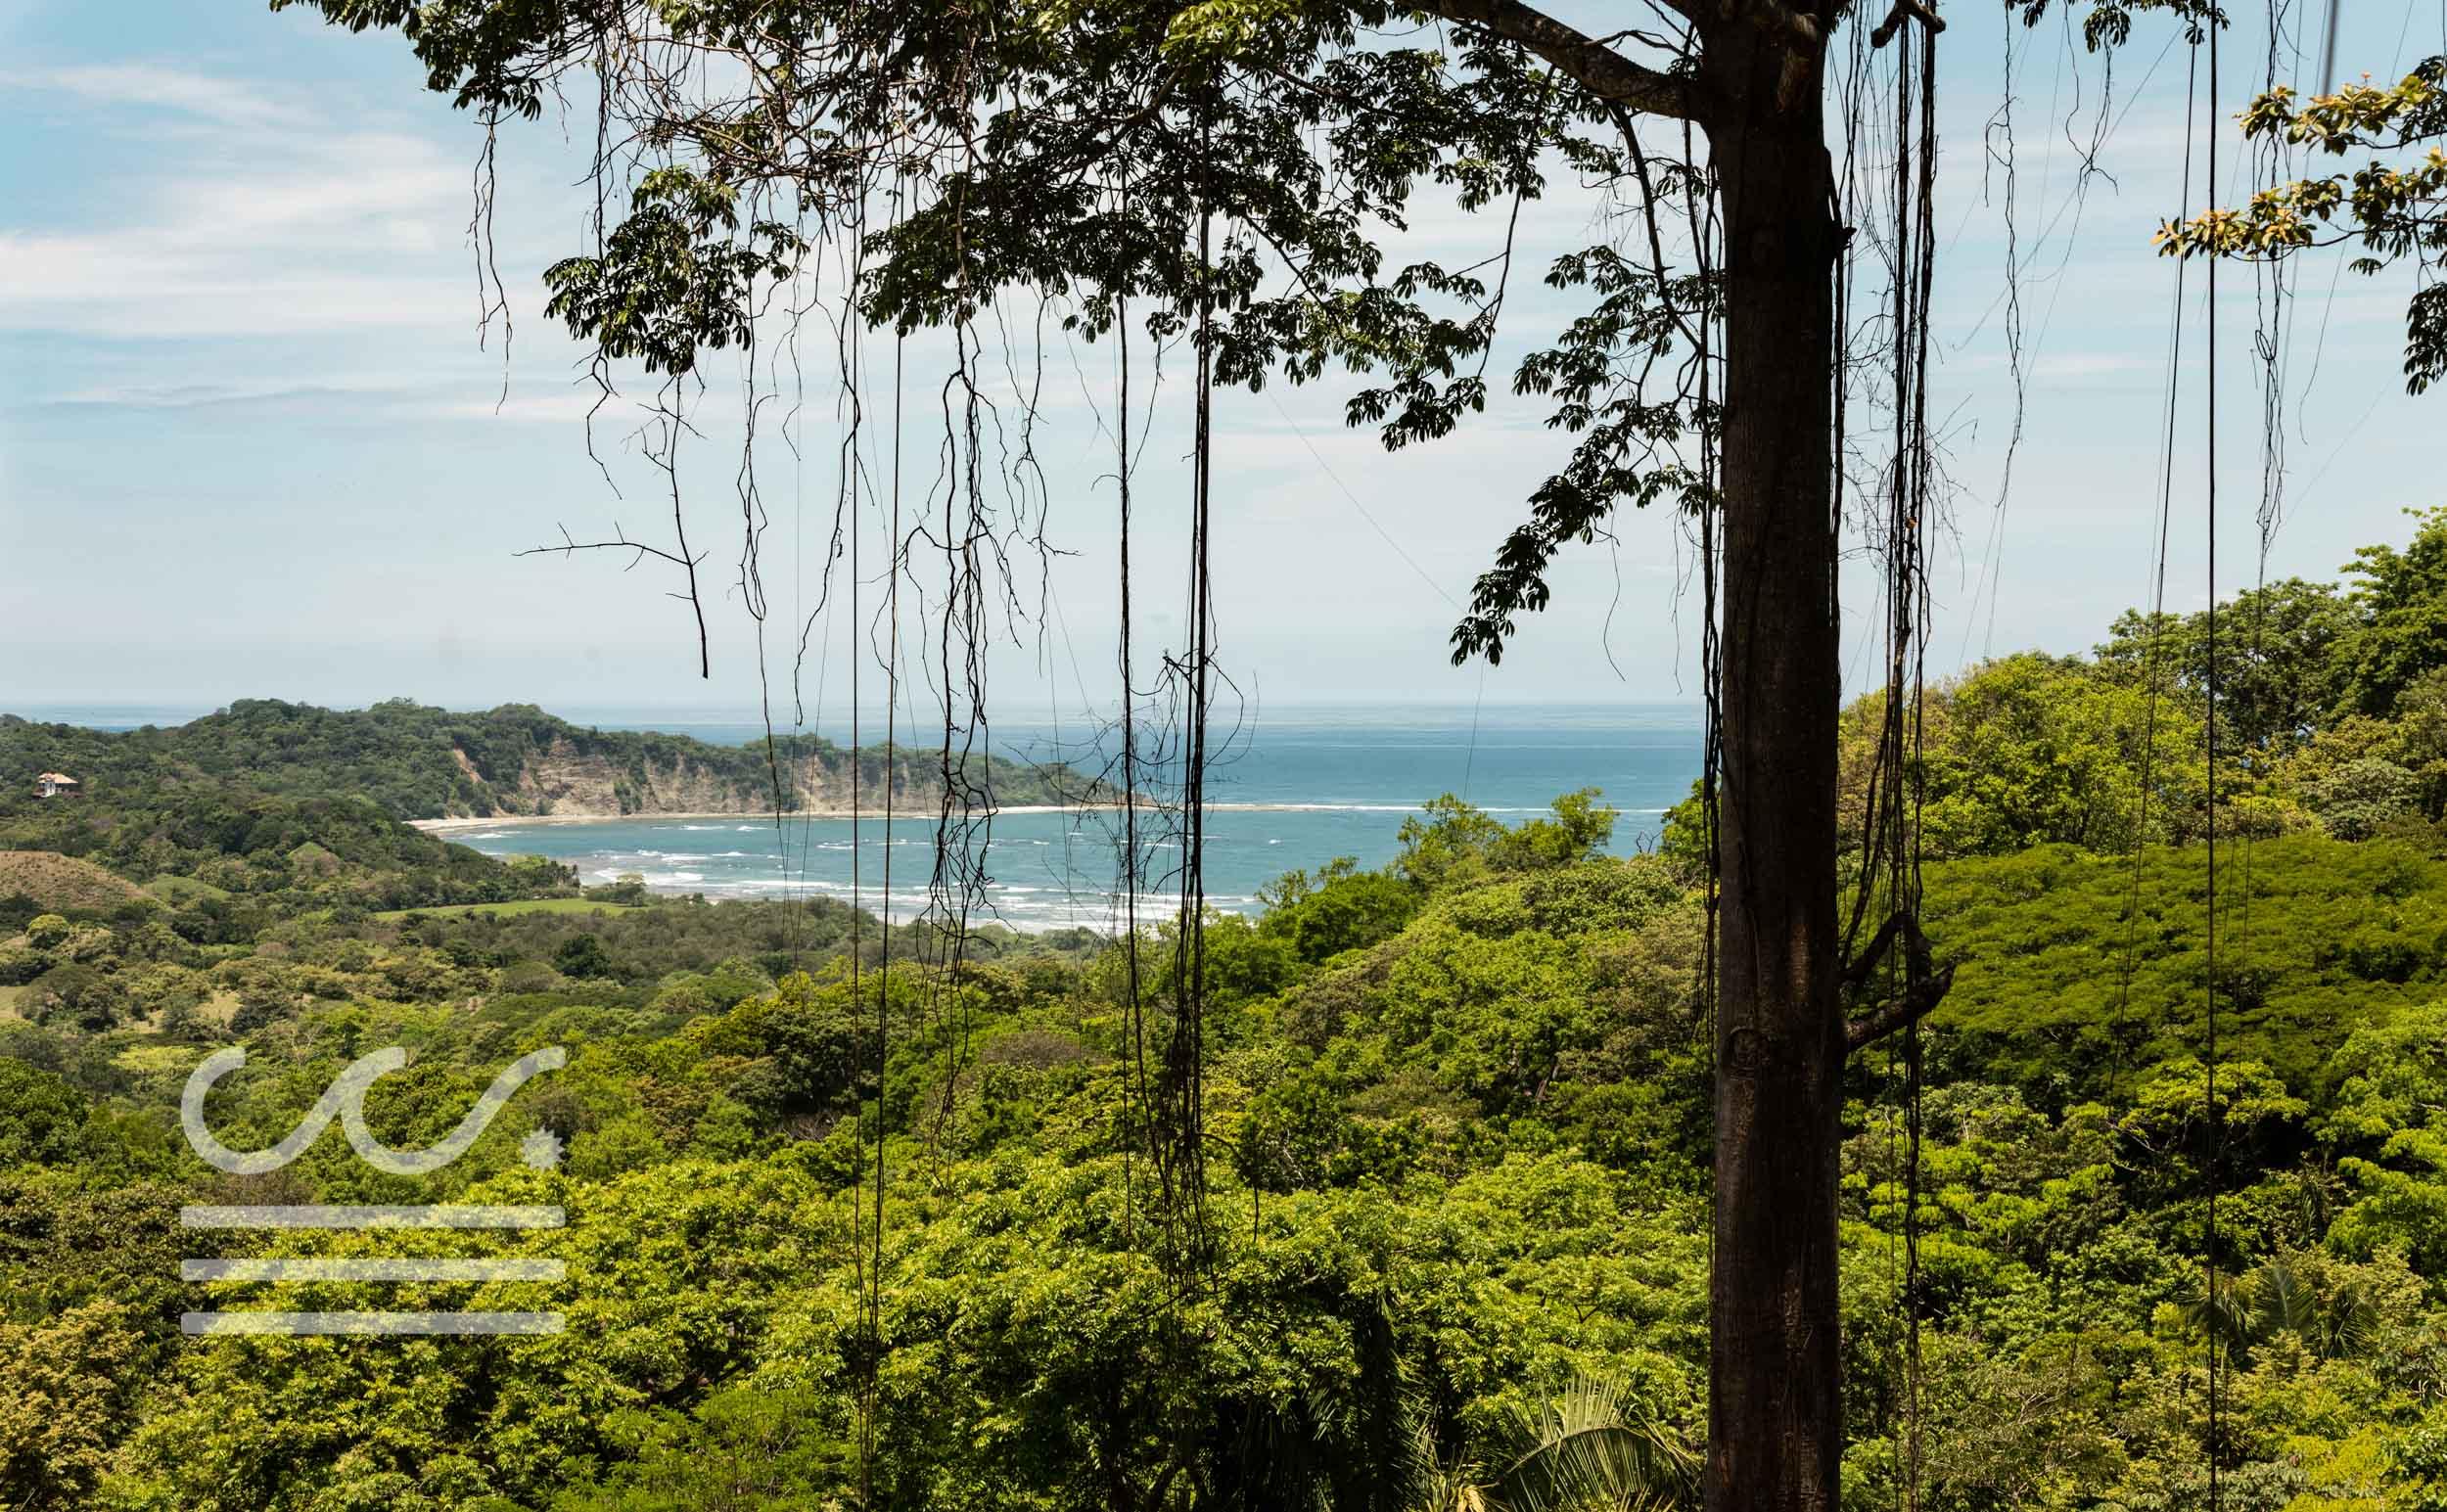 EE-102-Lot-Wanderlust-Realty-Real-Estate-Nosara-Costa-Rica-5.jpg